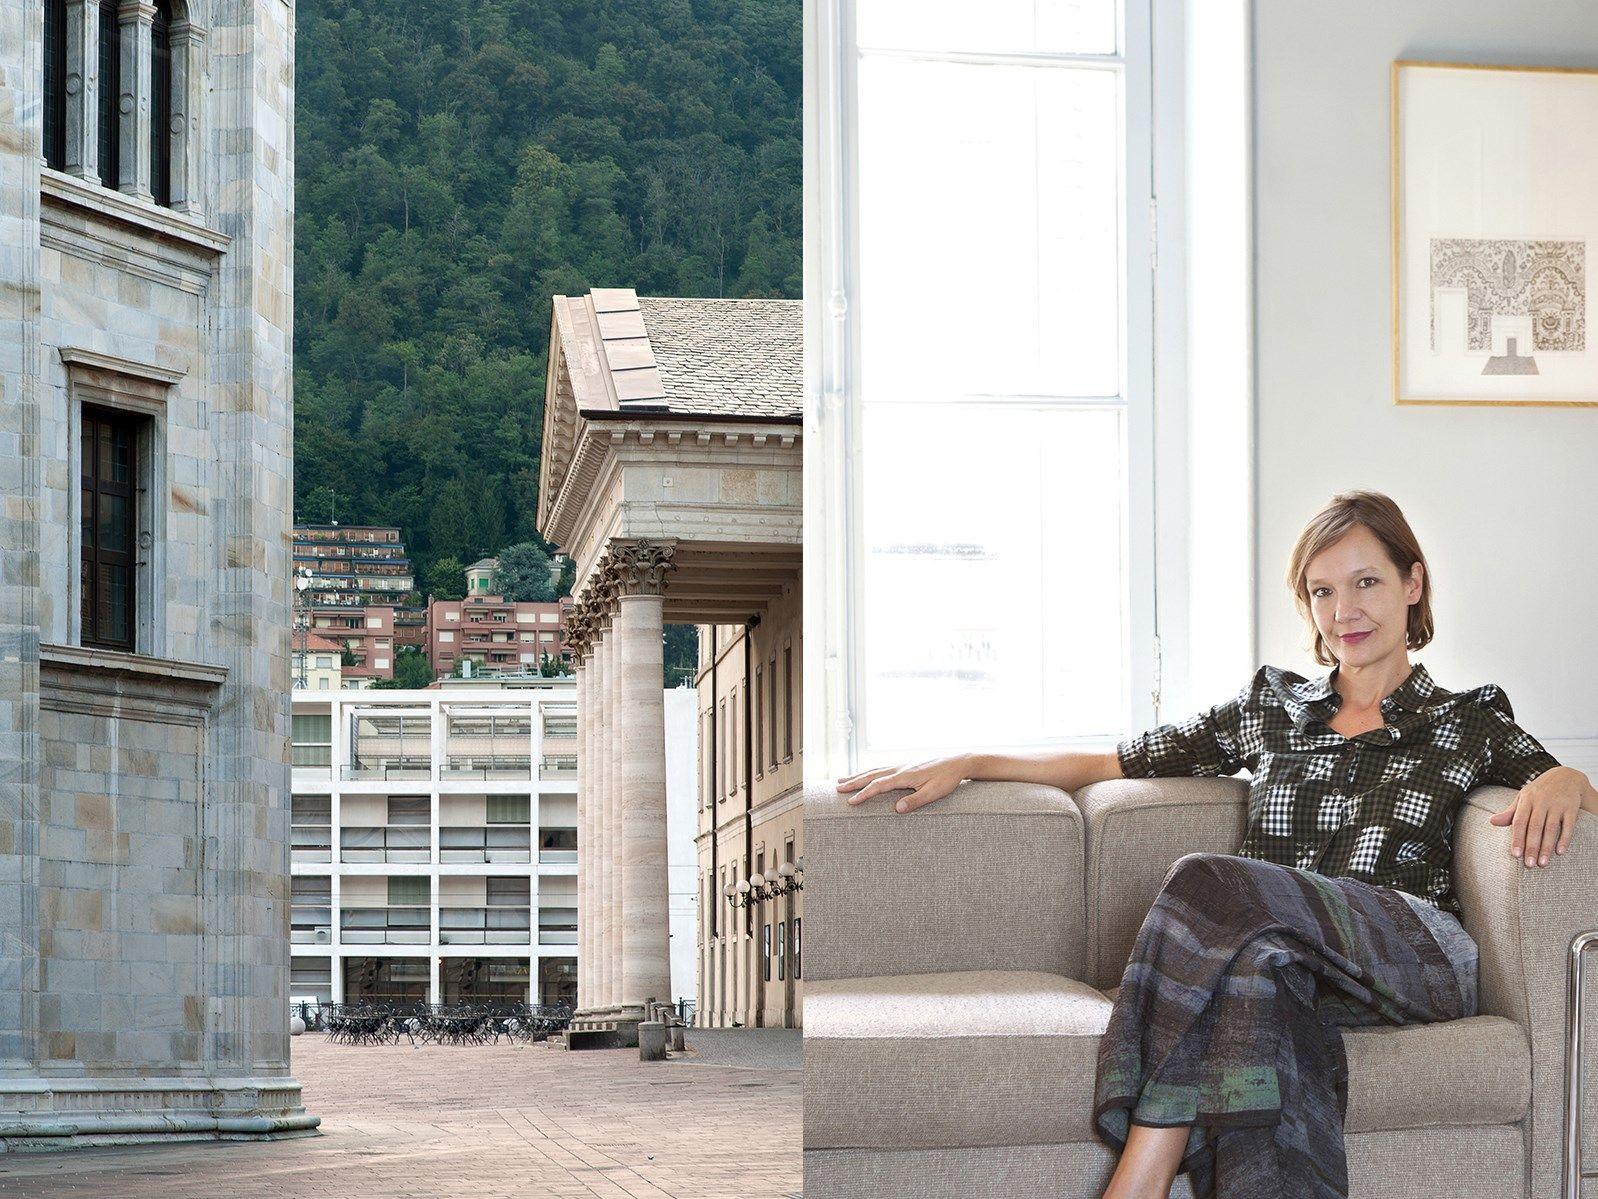 Teatro Sociale Como - ©Francesco Arena;Margherita Ratti_fair curator ©Alessandra Iannello